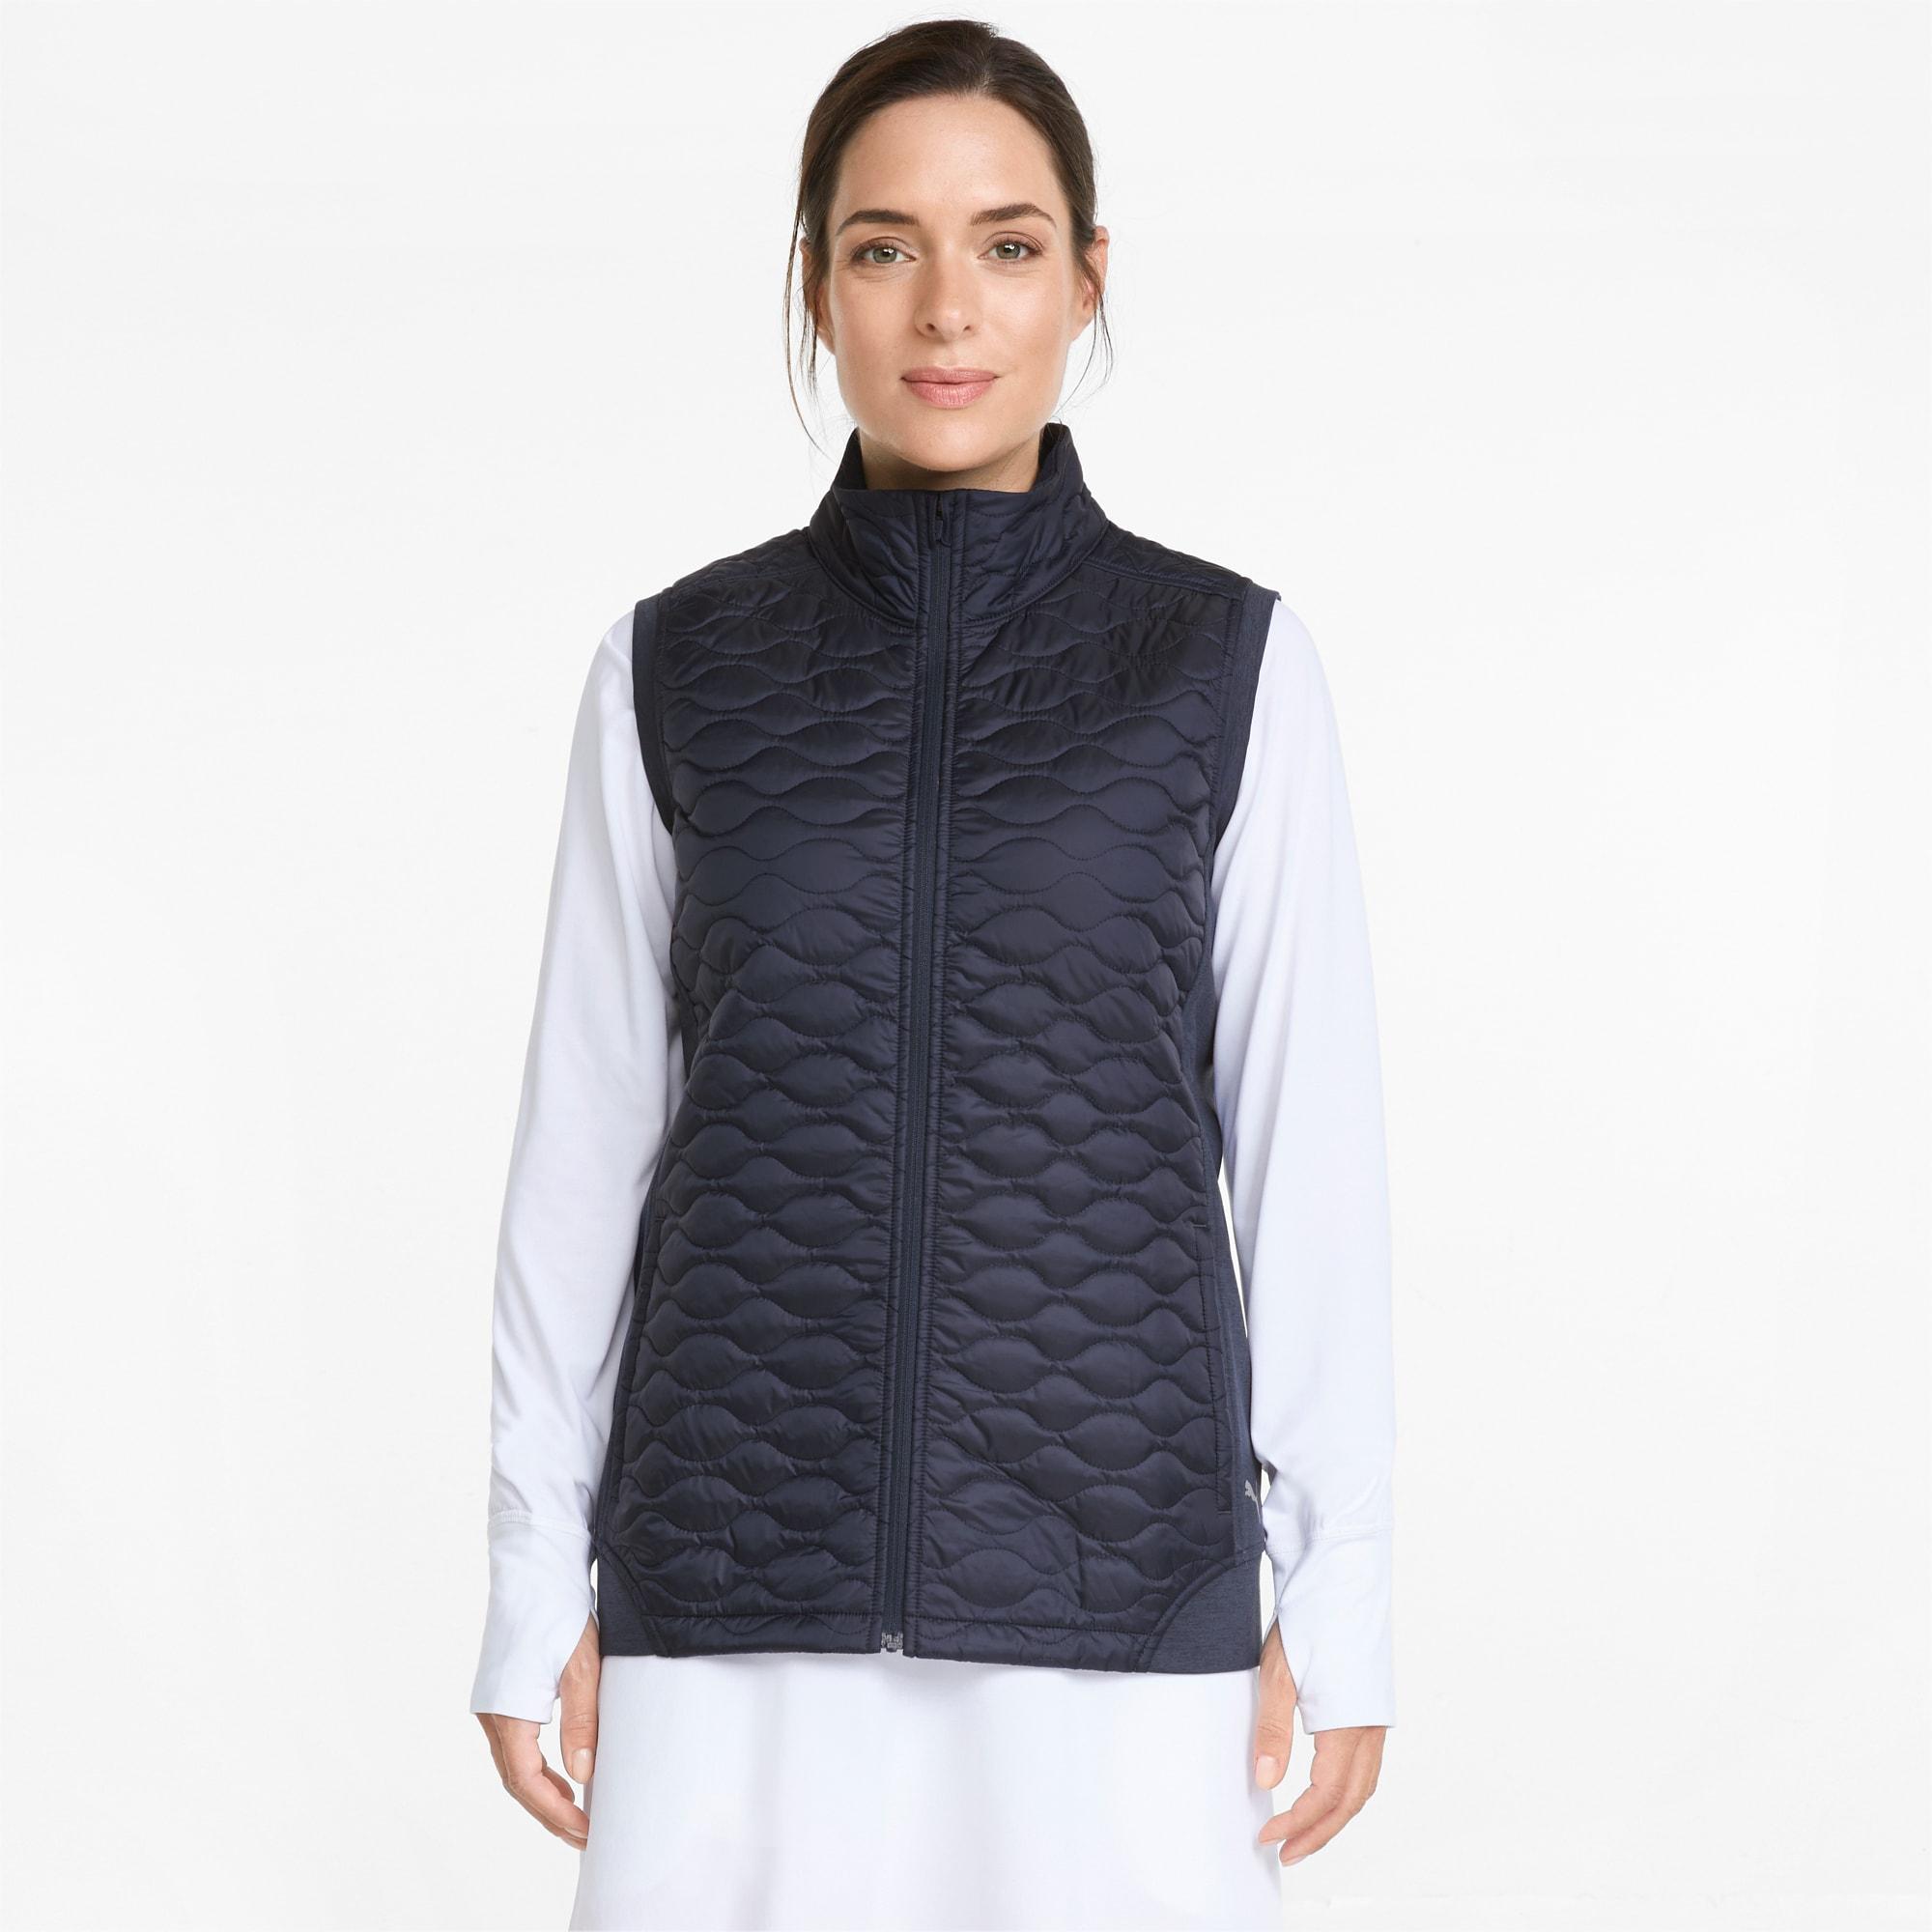 Veste de golf Cloudspun WRMLBL , Bleu, Taille L, Vêtements - PUMA - Modalova